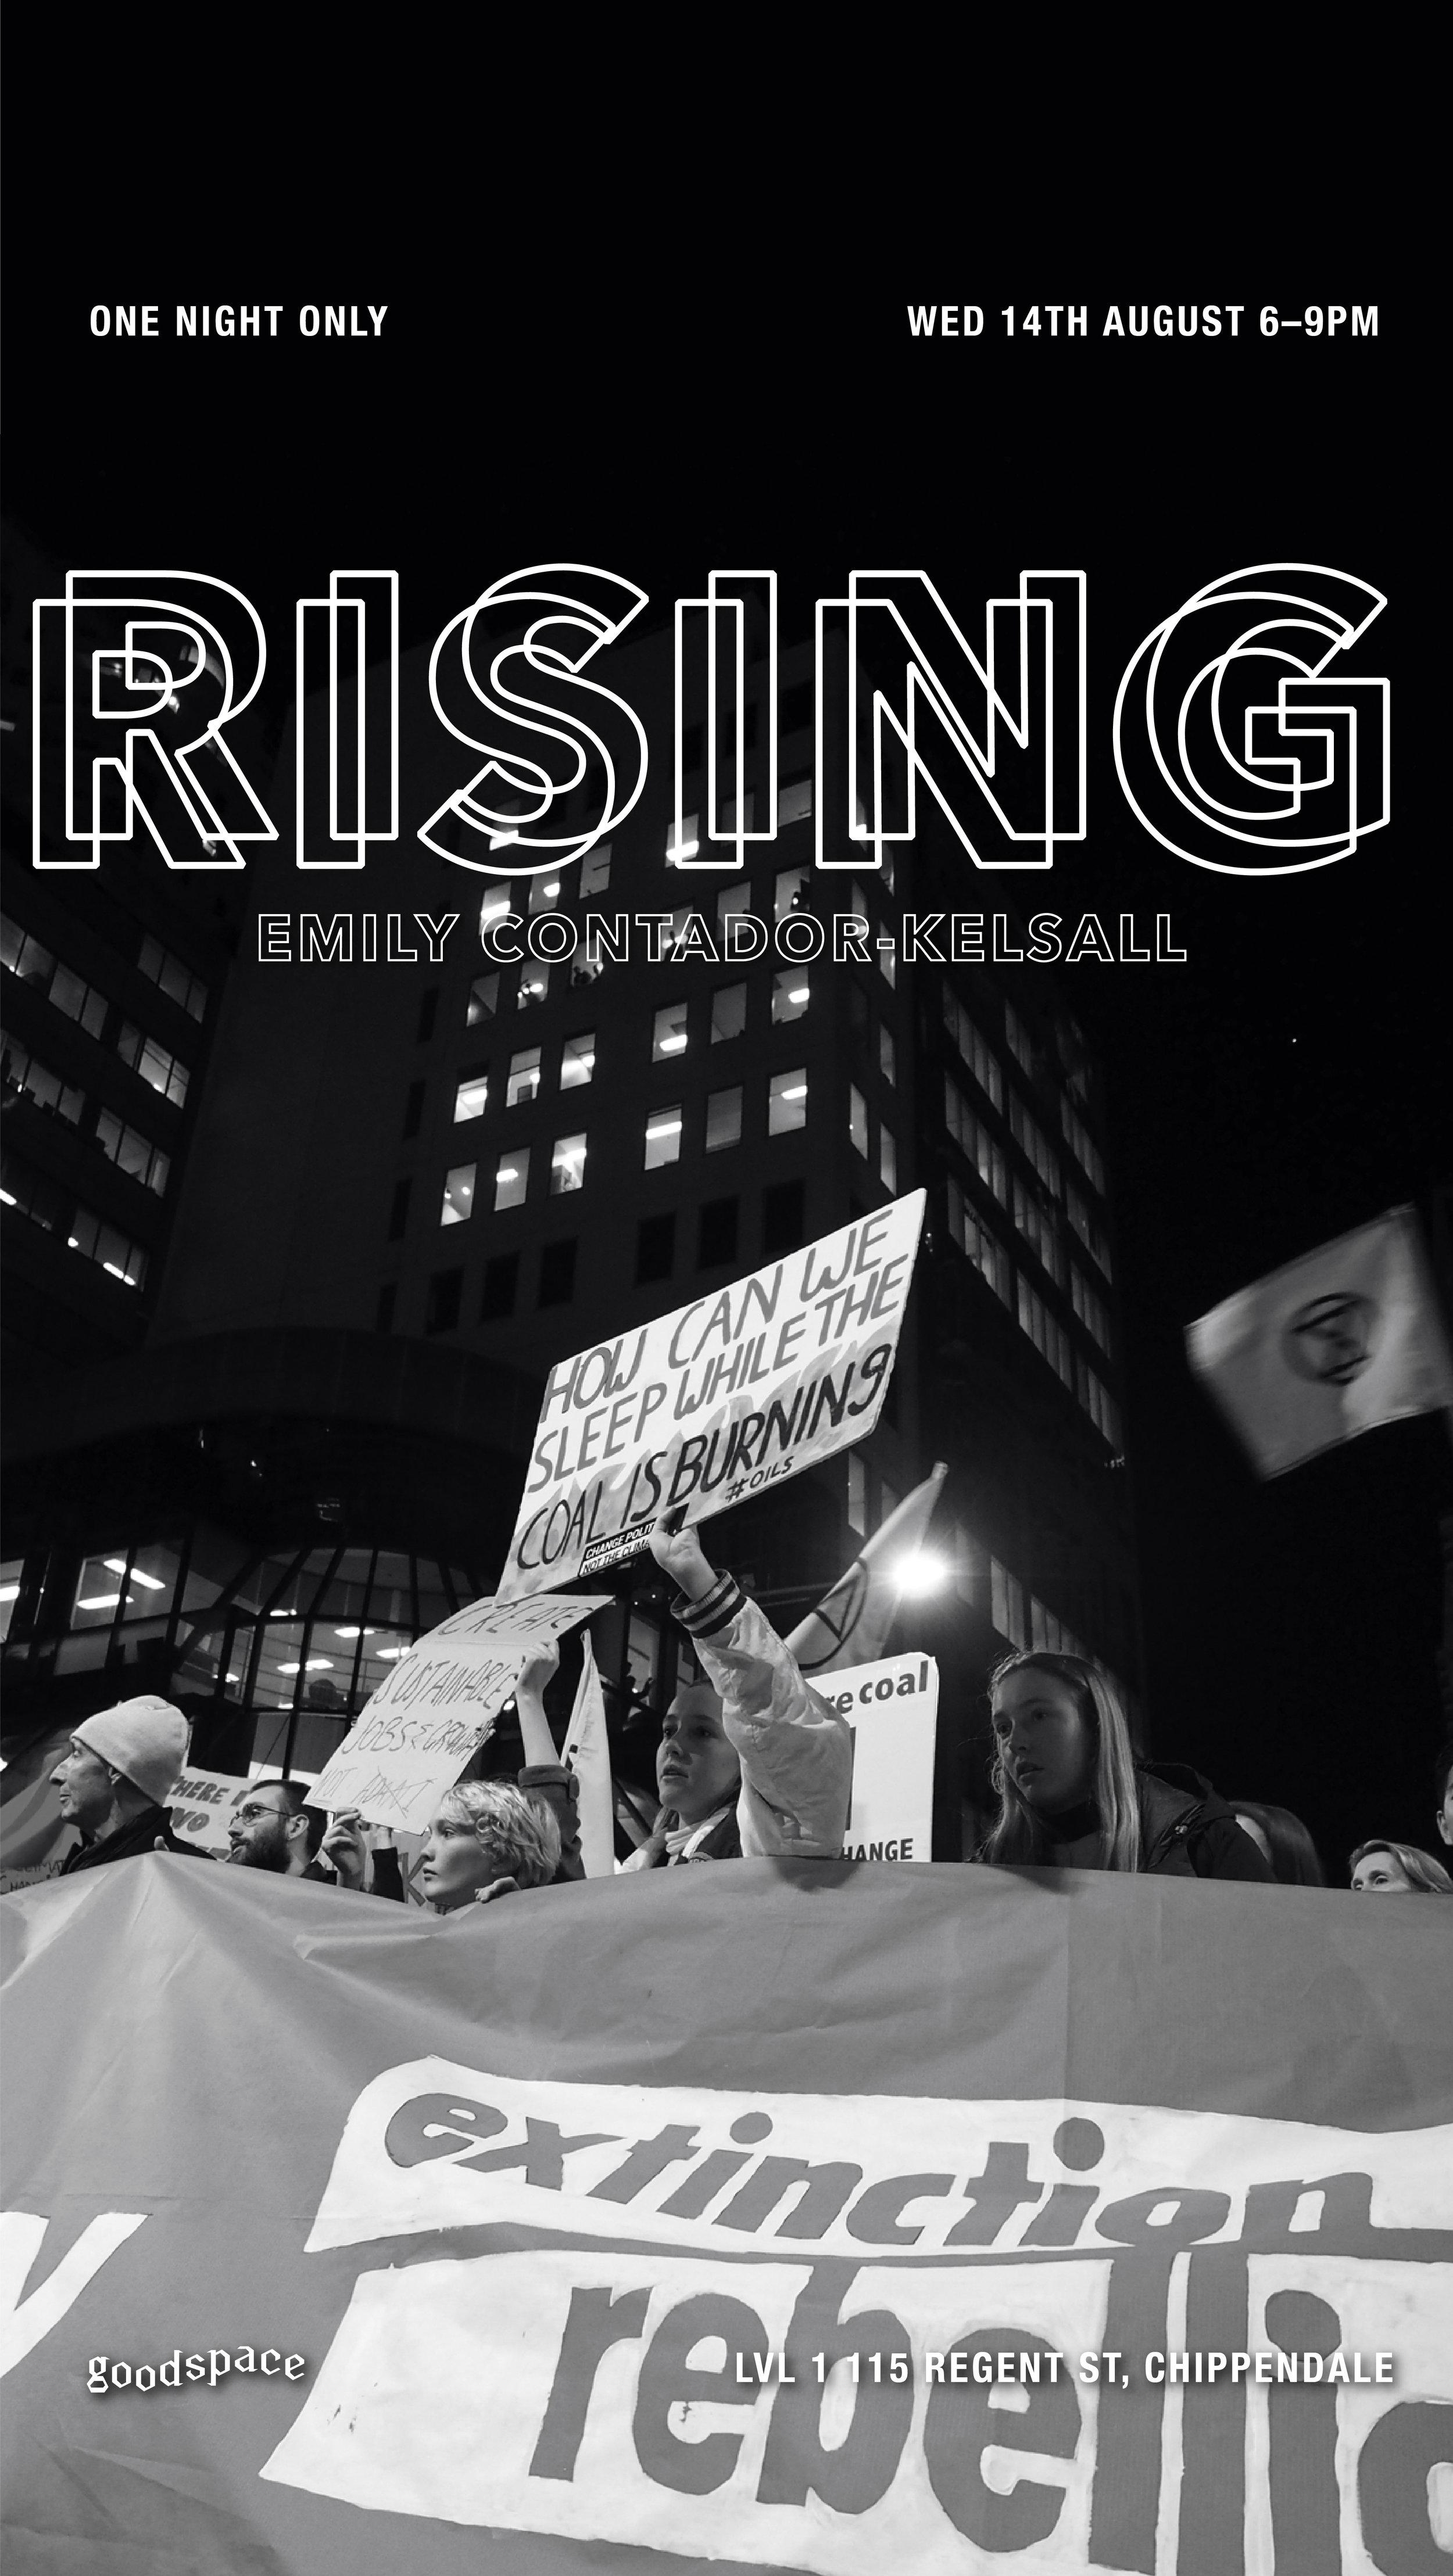 Rising-02.jpg